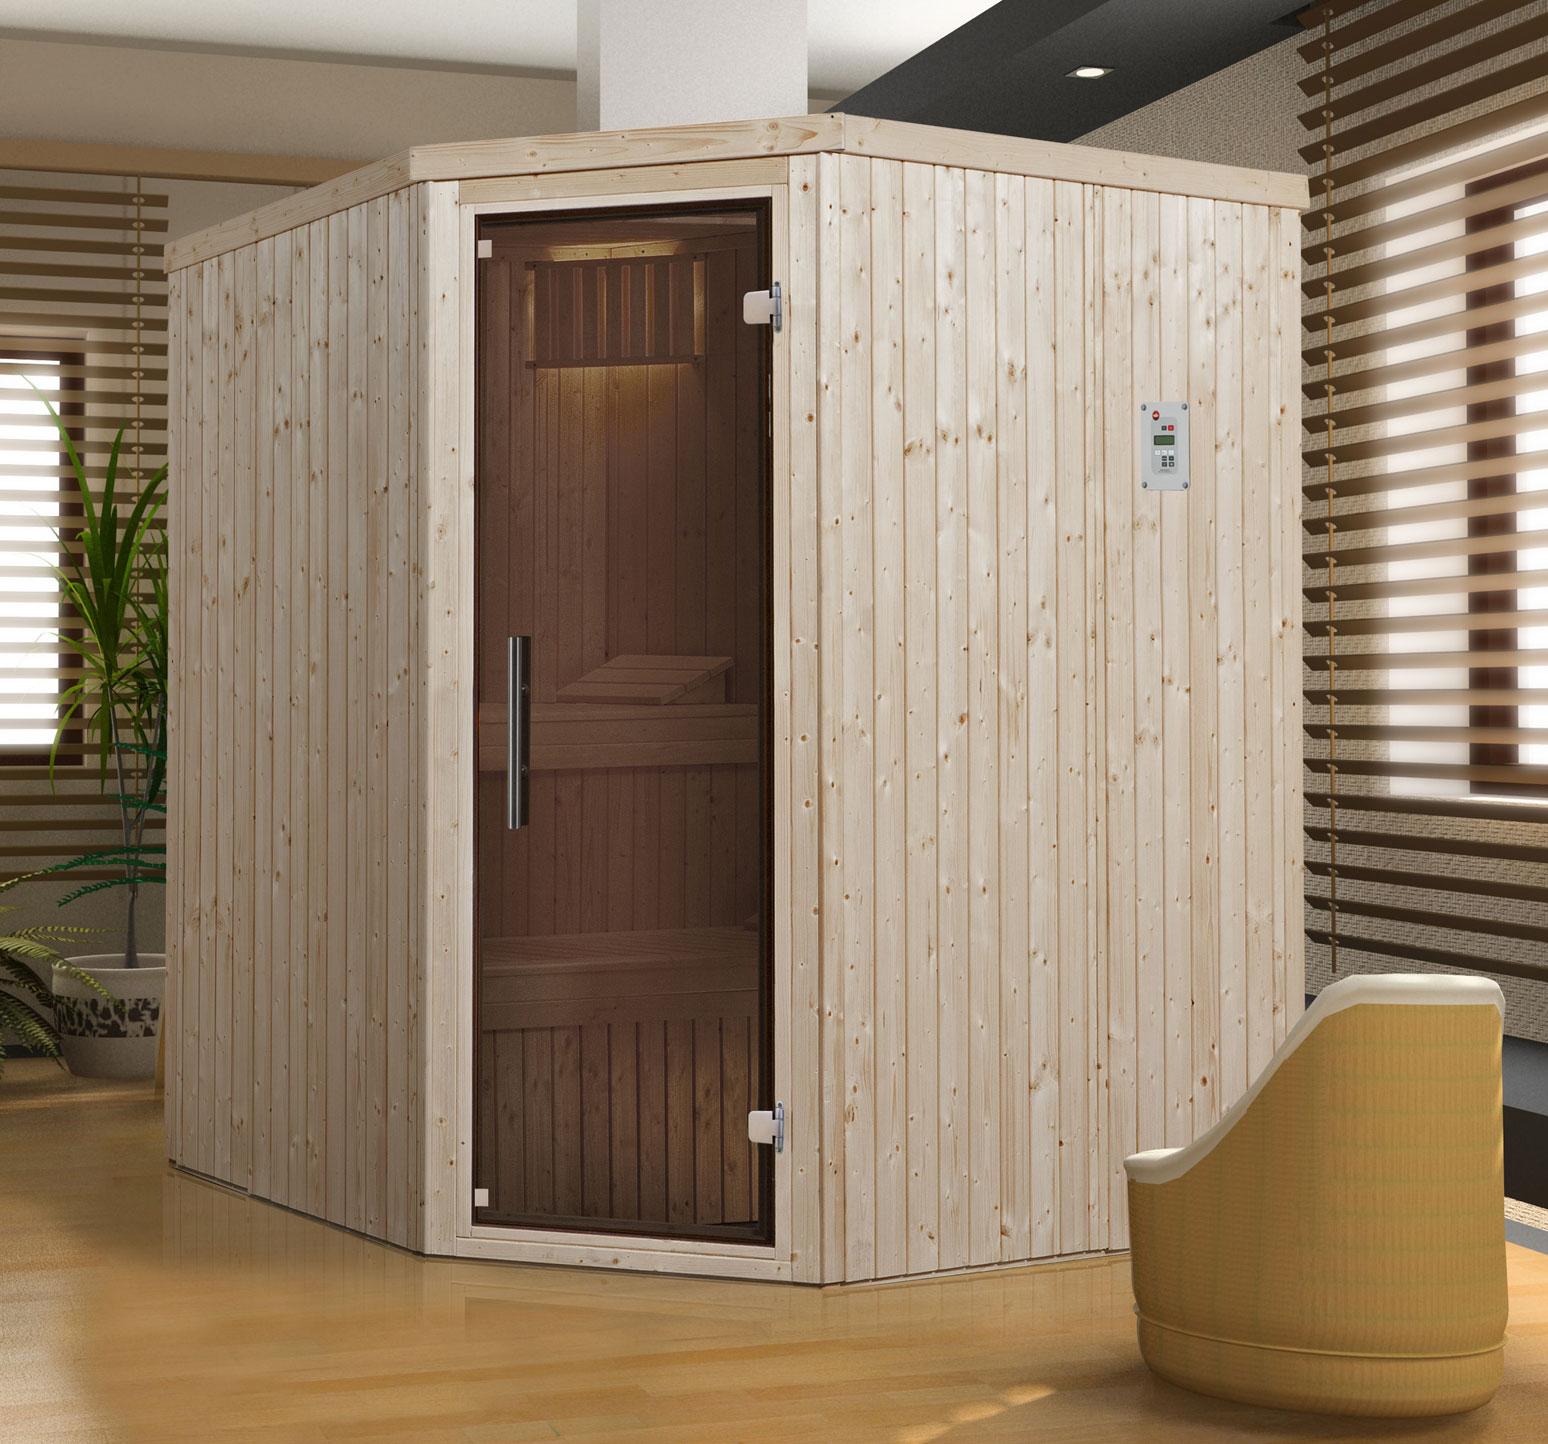 weka sauna 508 gt 230 volt elementsauna ohne saunaofen. Black Bedroom Furniture Sets. Home Design Ideas